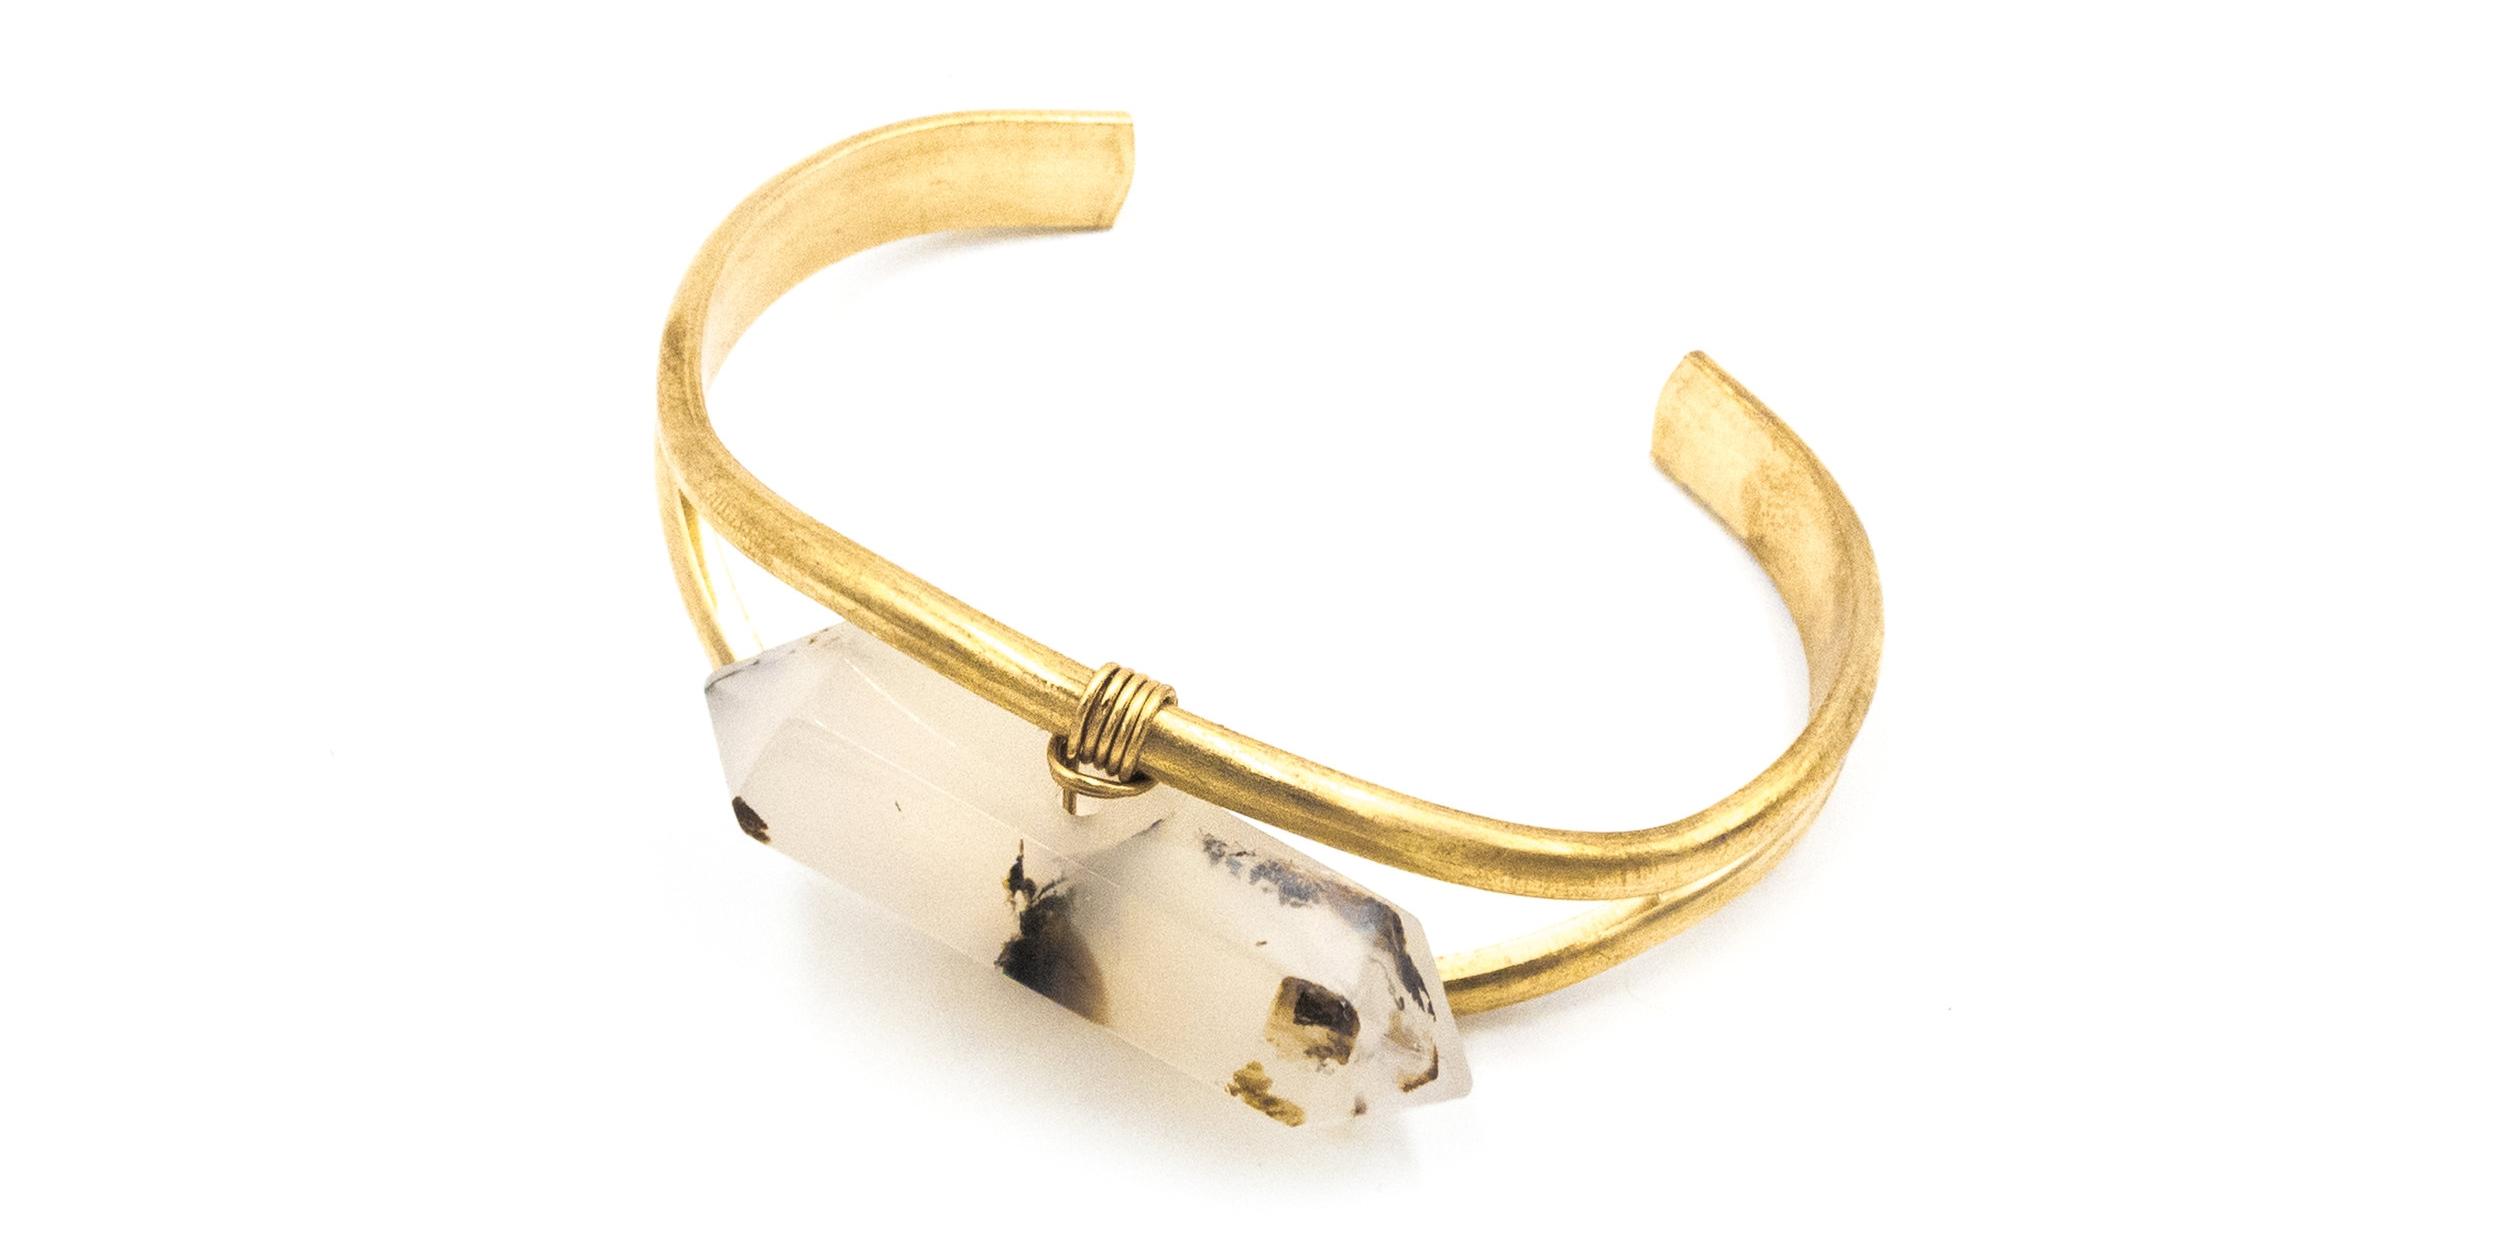 BC032-HA Crystal Cuffs in Heihua Agate Variant 2.jpg